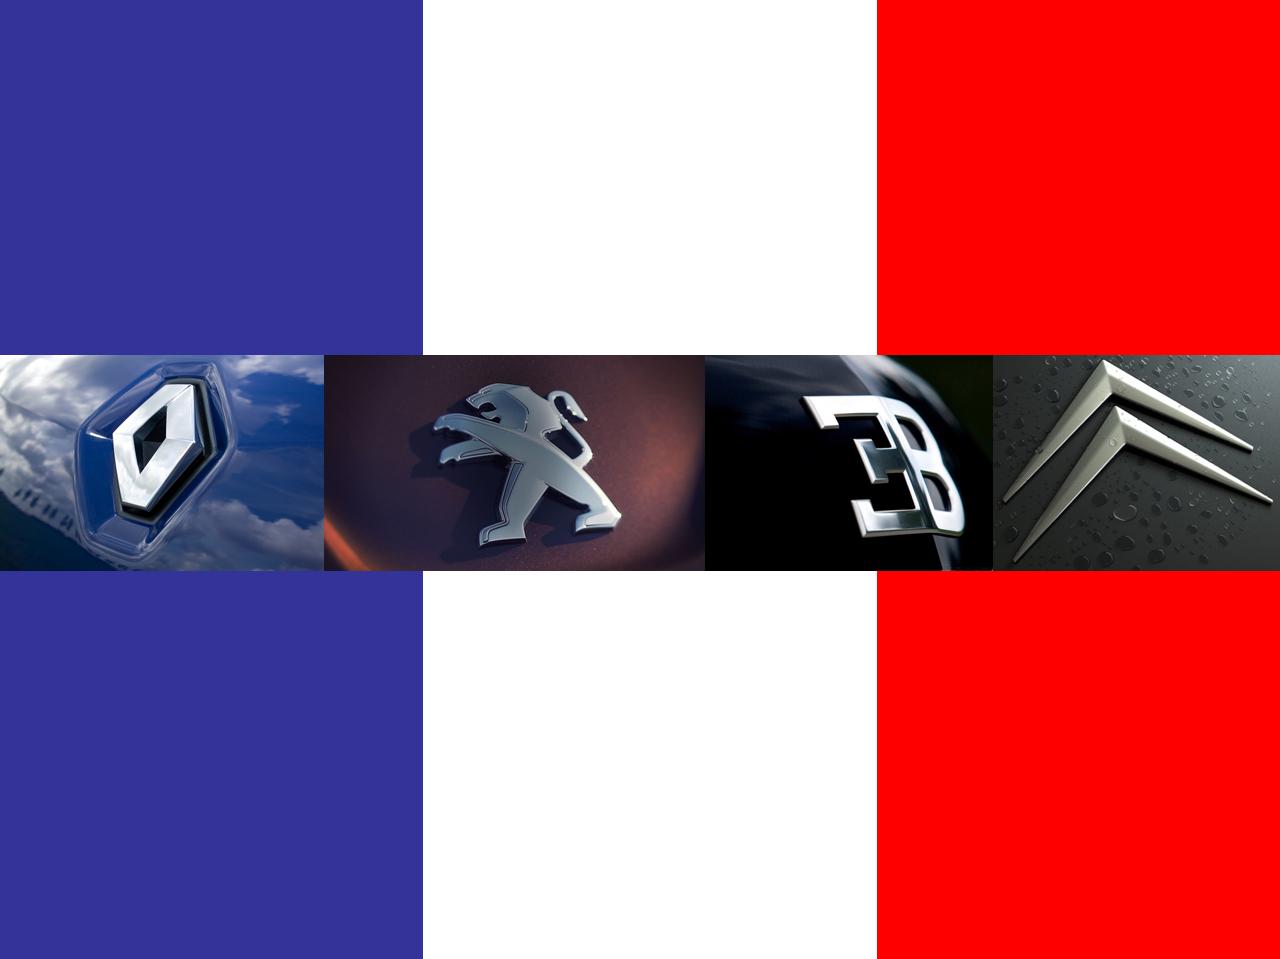 French car emblems